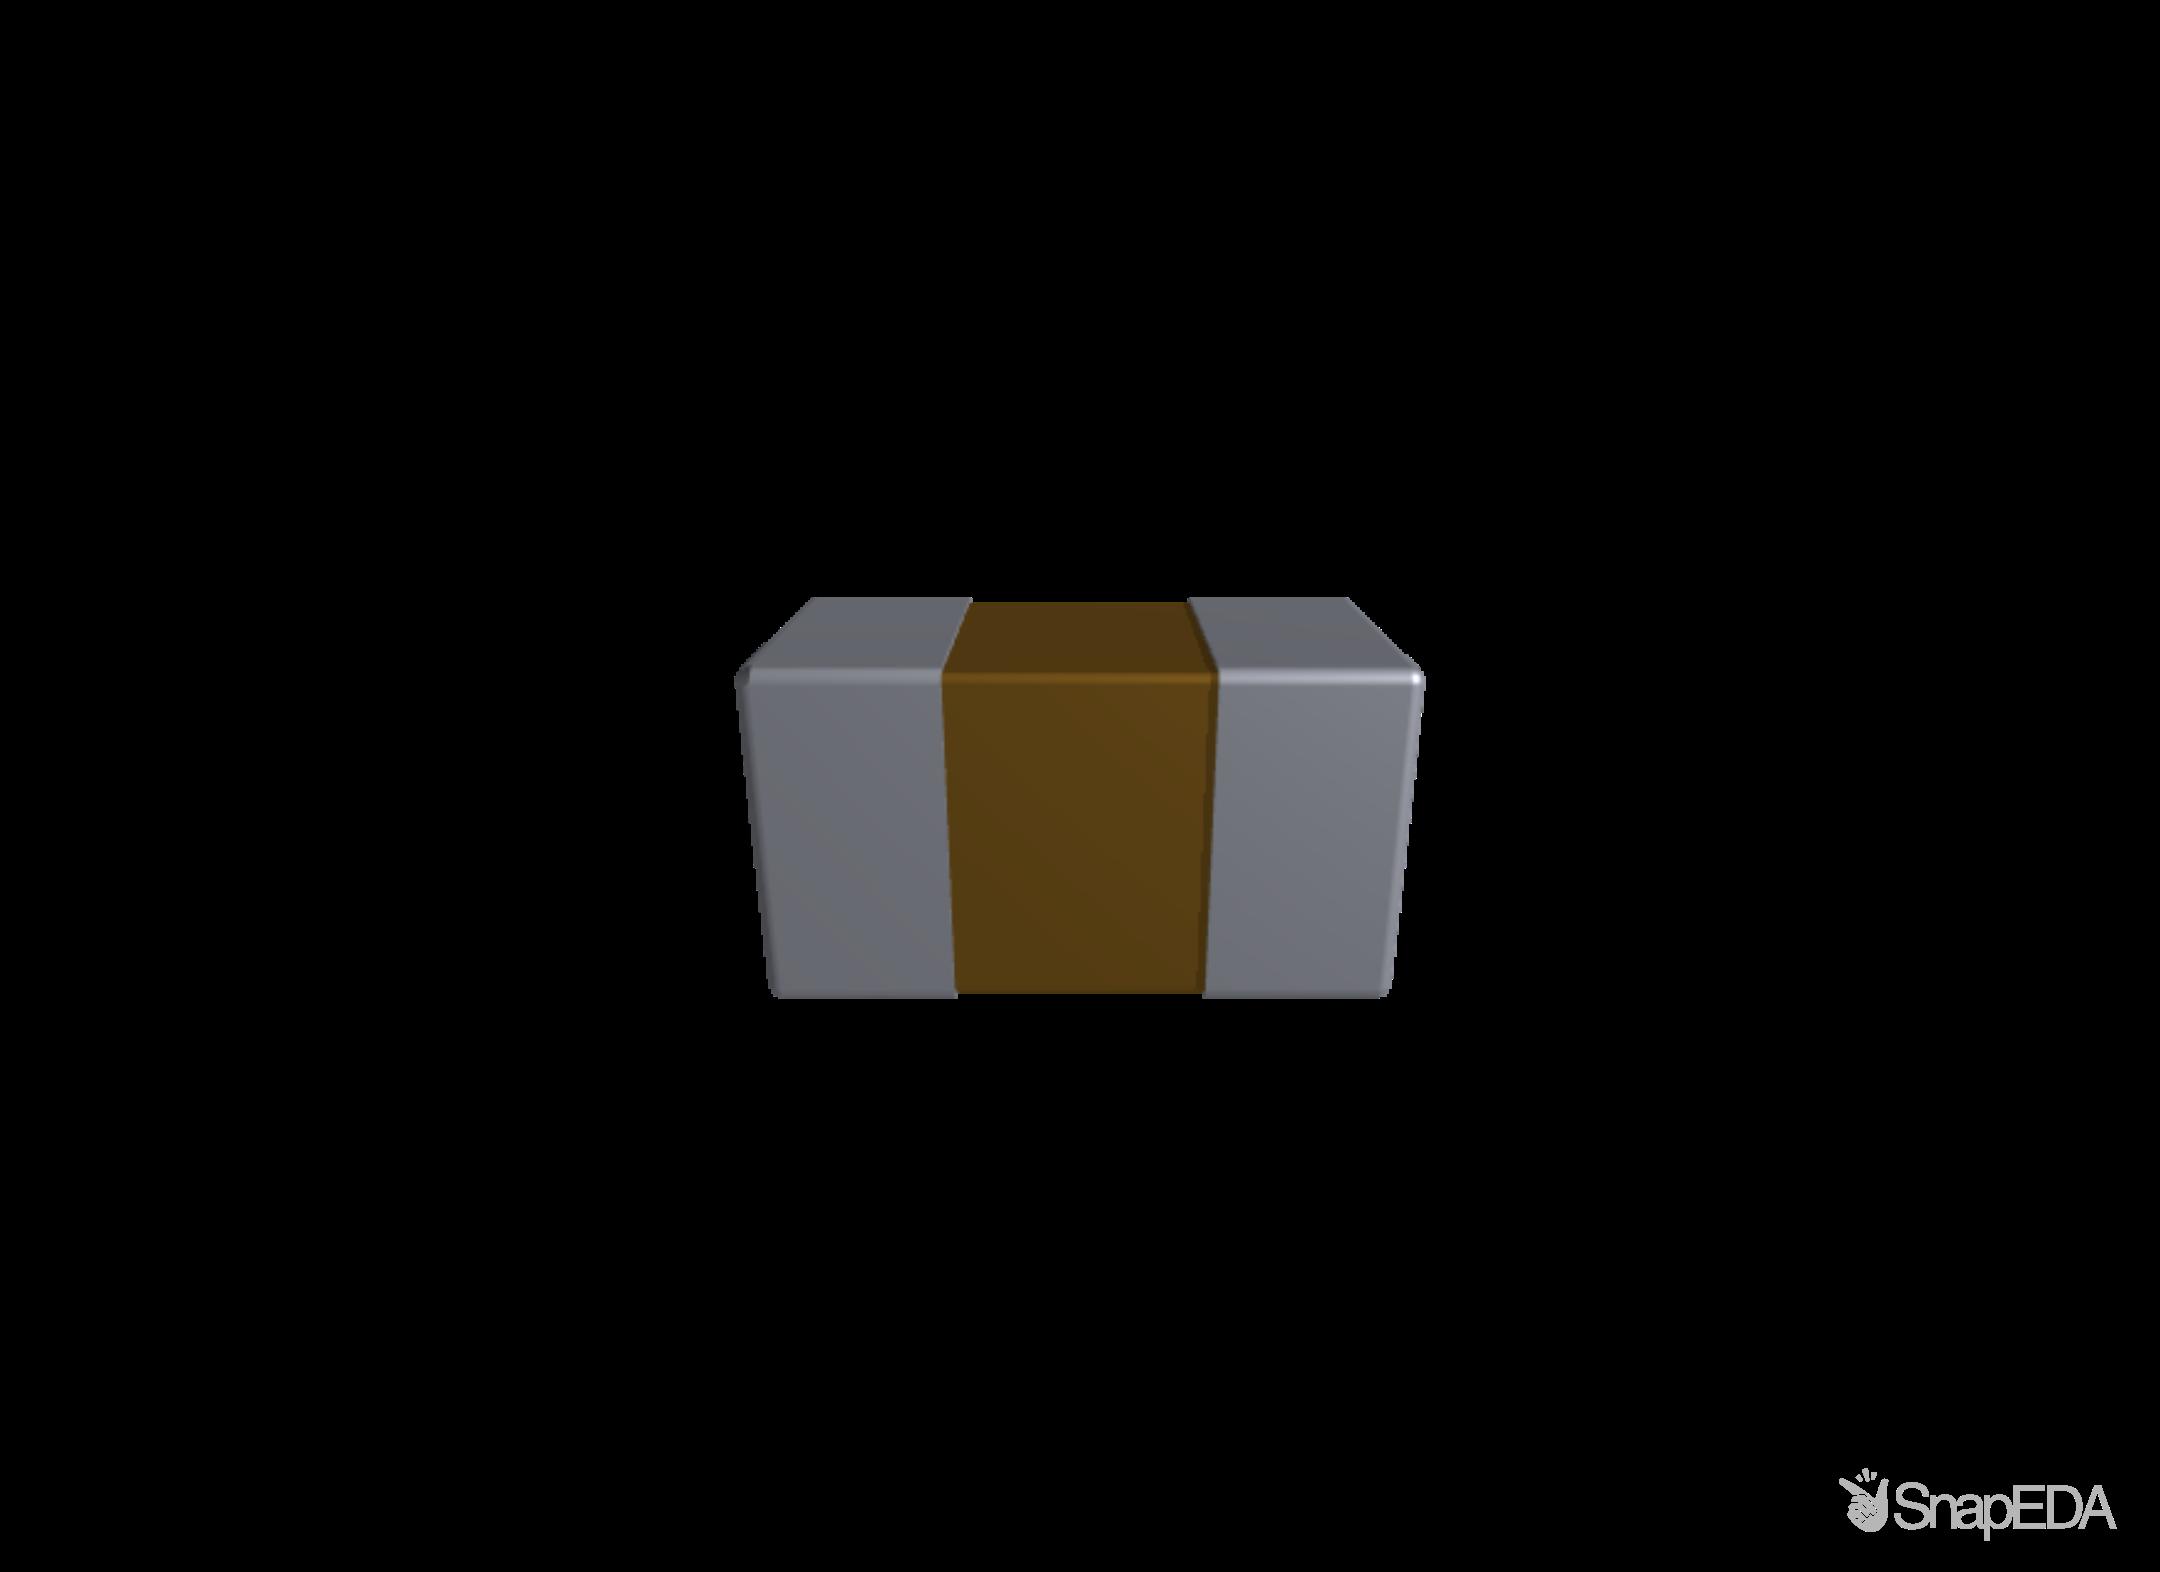 C0402C331J5GACTU 3D Model